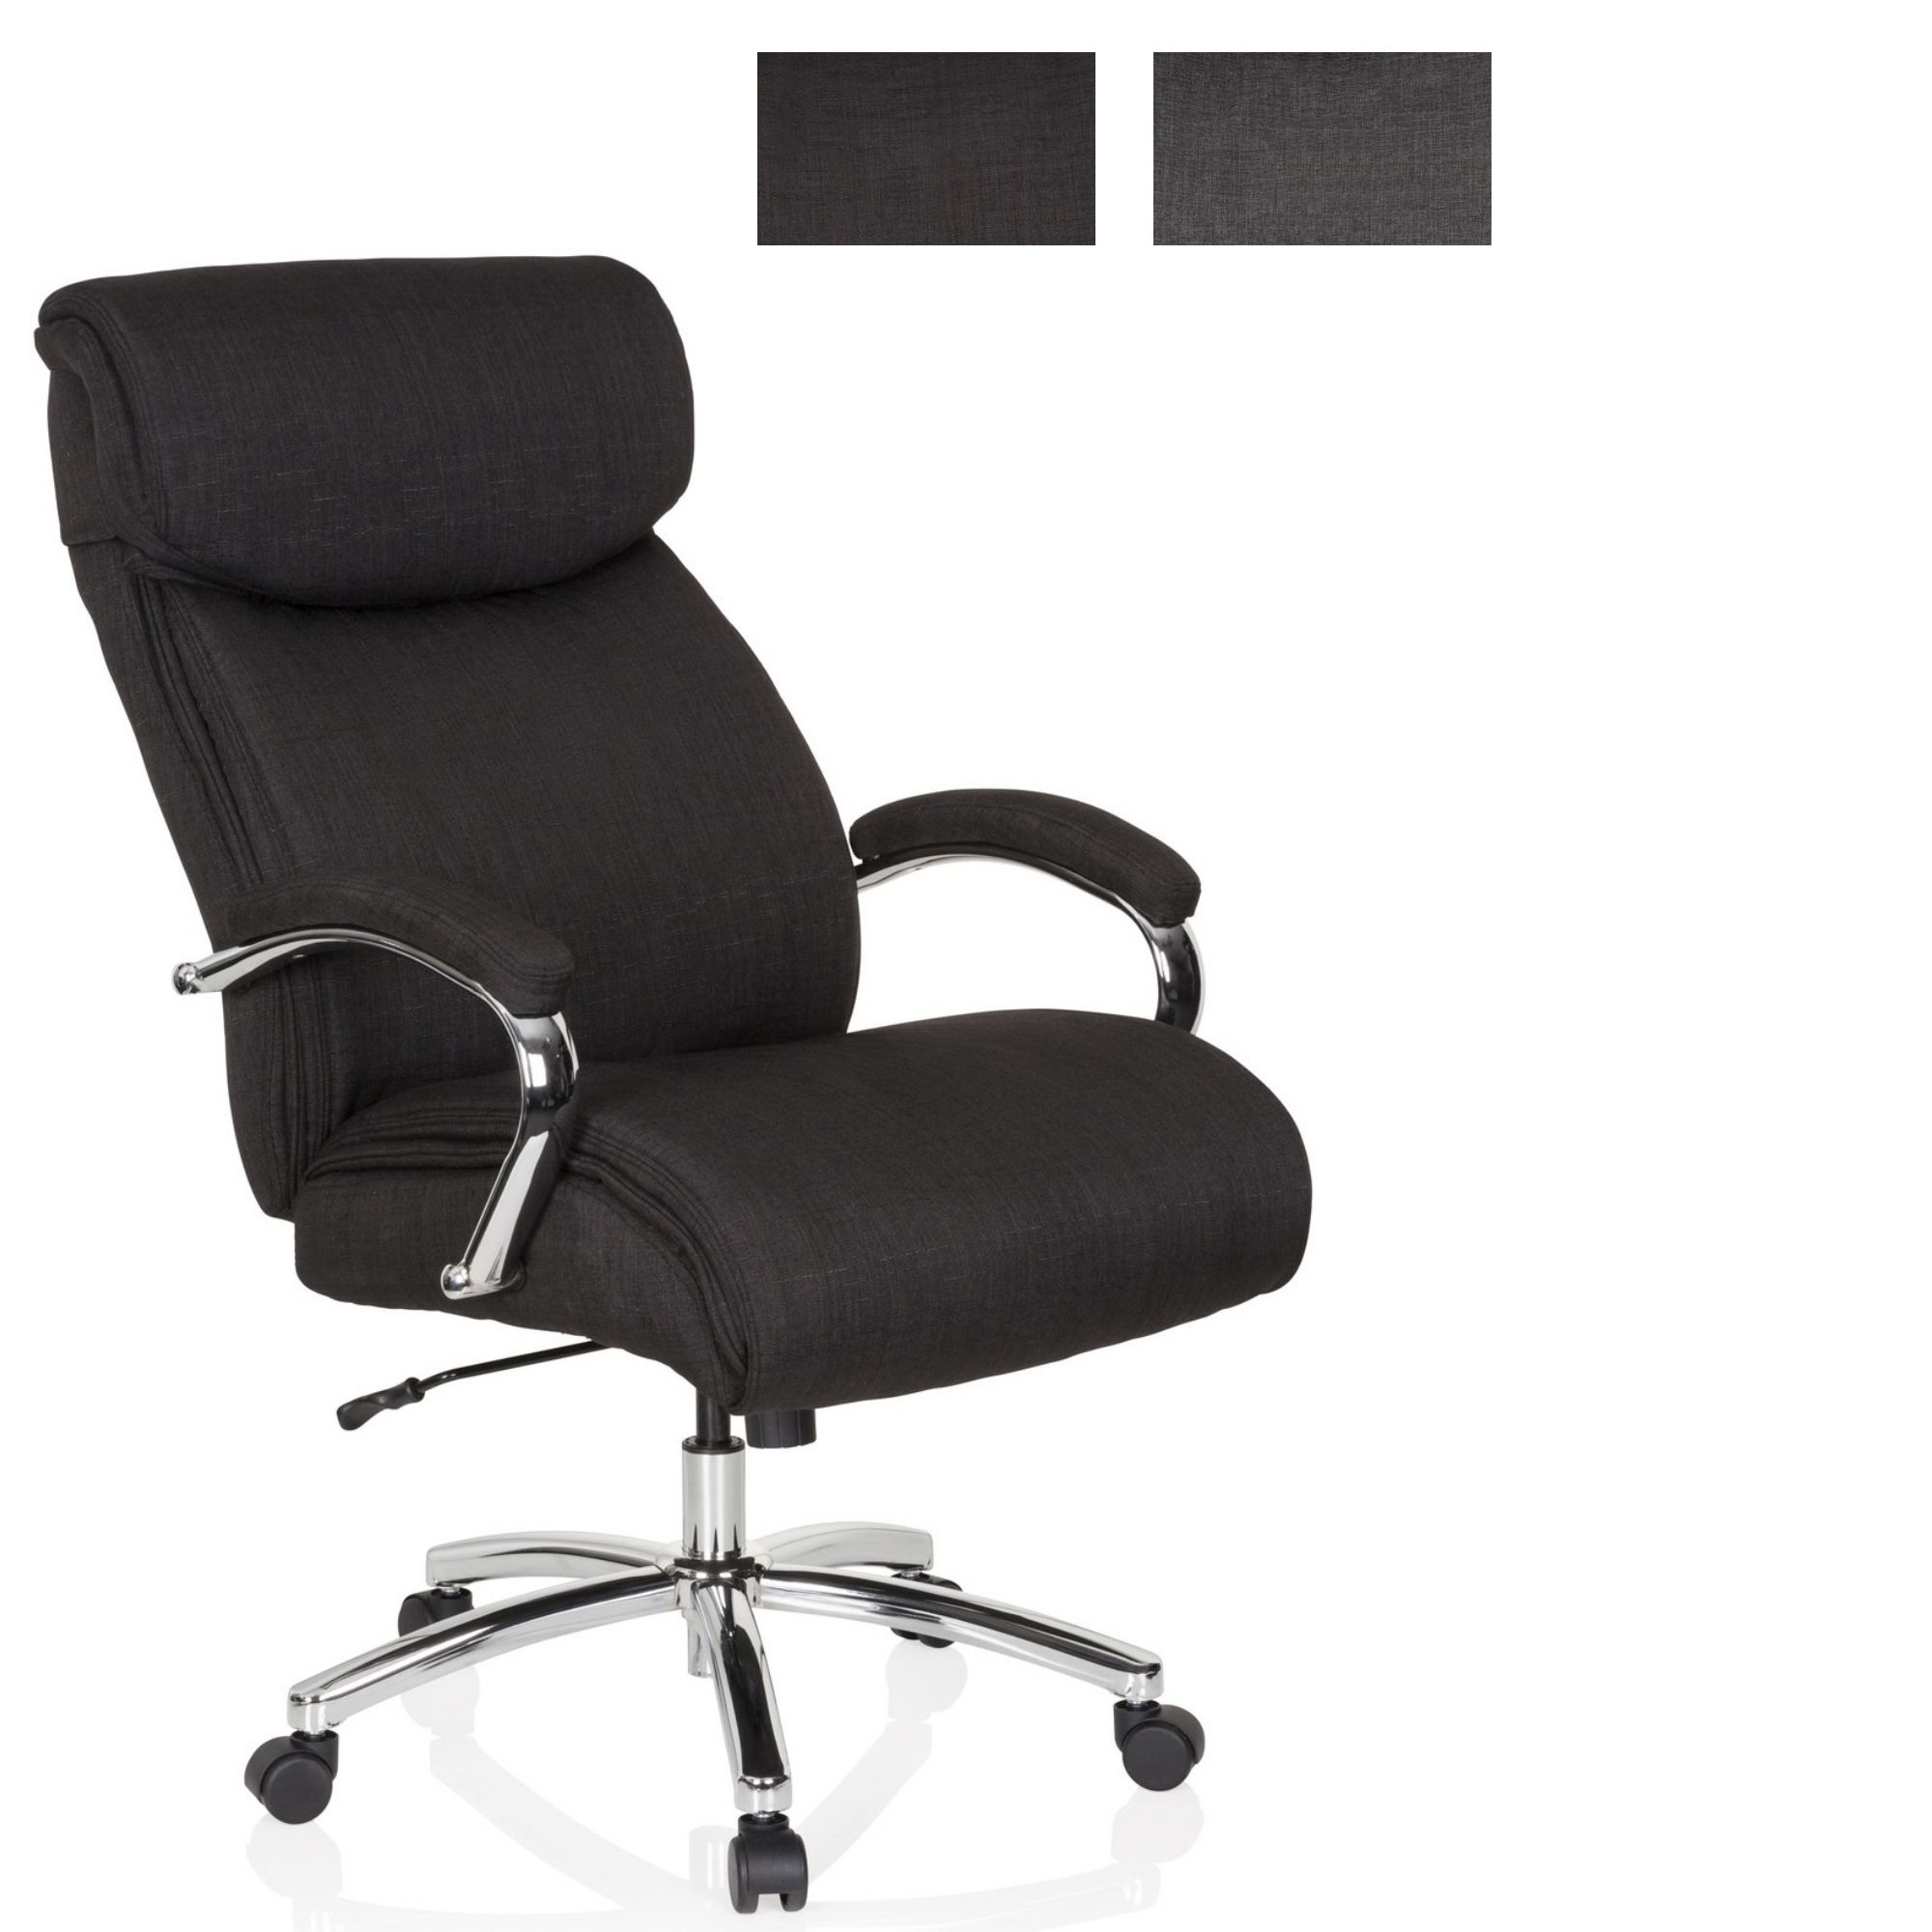 Drehstuhl Bürostuhl Chefsessel bis 180 kg Kunstleder XXL EVEREST hjh OFFICE